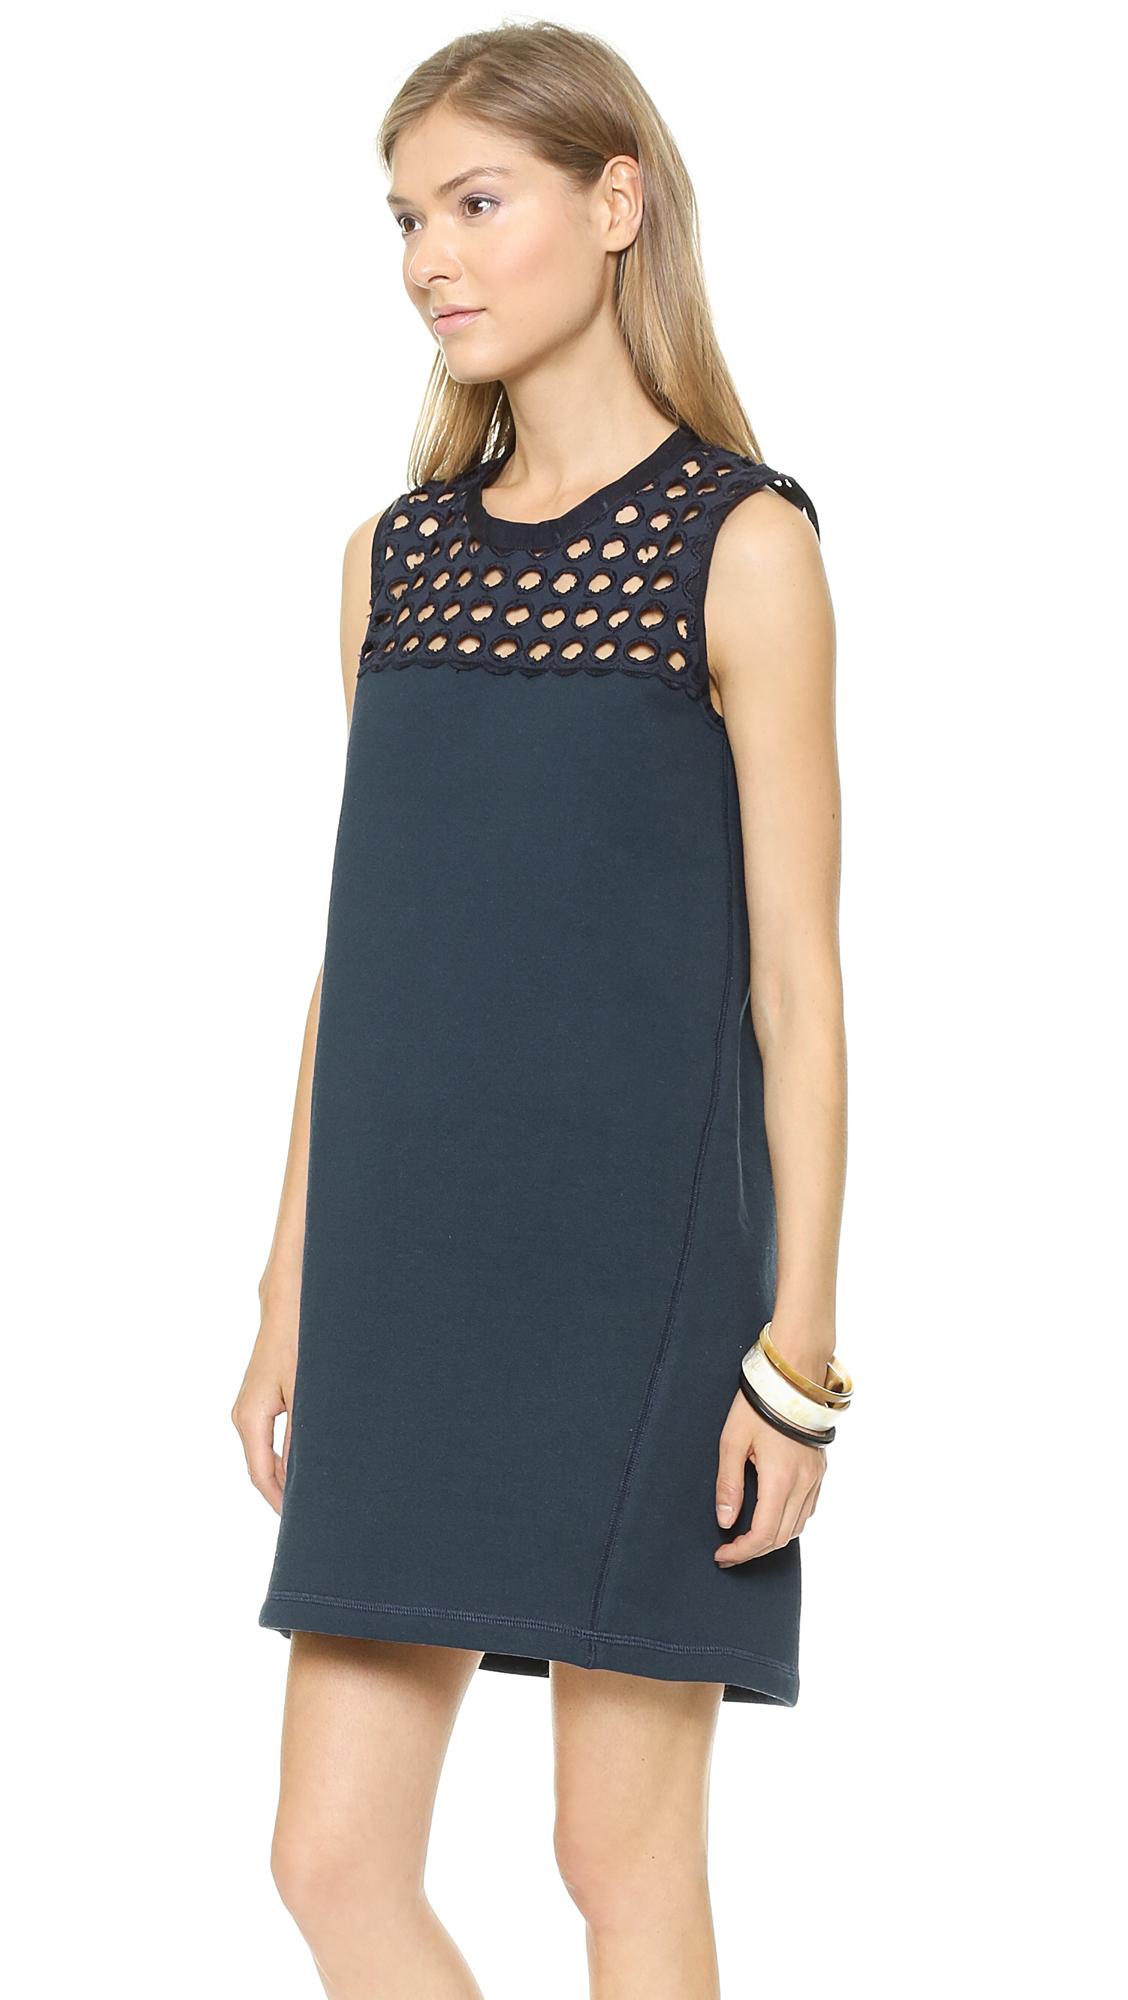 Find great deals on eBay for Blue Eyelet Dress in Elegant Dresses for Women. Shop with confidence.